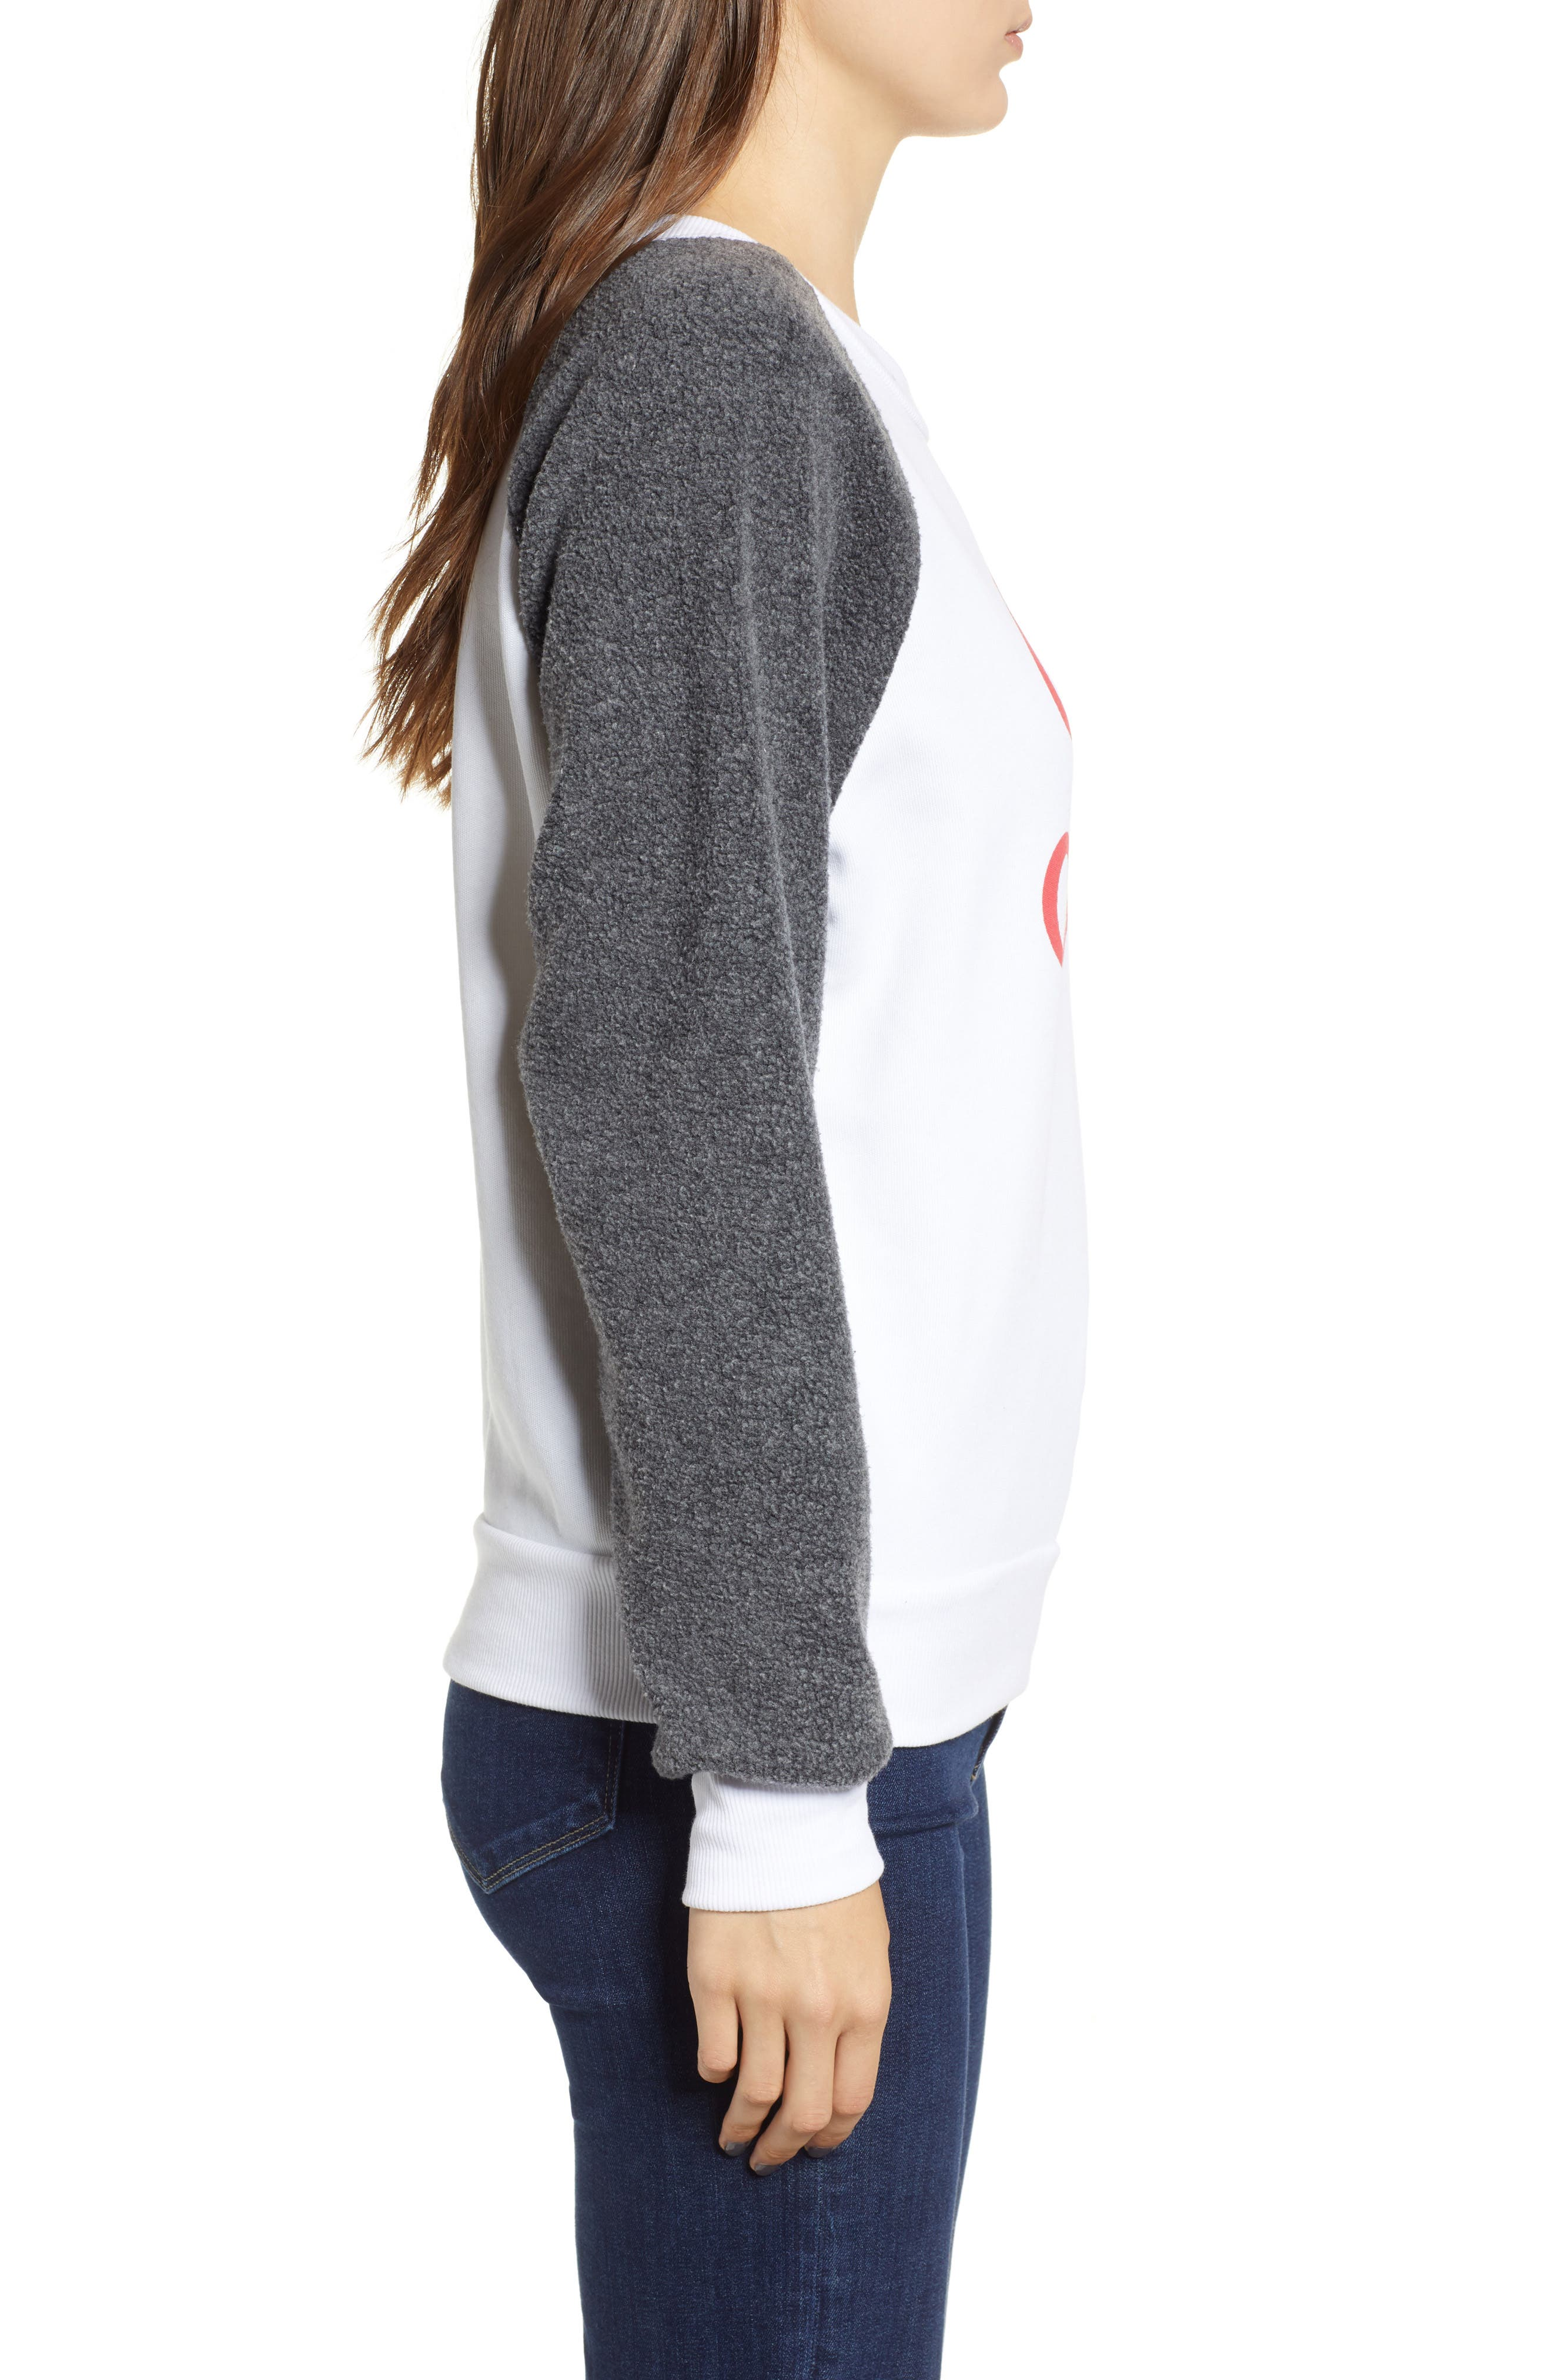 Fatale Fleece Sleeve Sweatshirt,                             Alternate thumbnail 3, color,                             CLEAN WHITE/ CLEAN BLACK